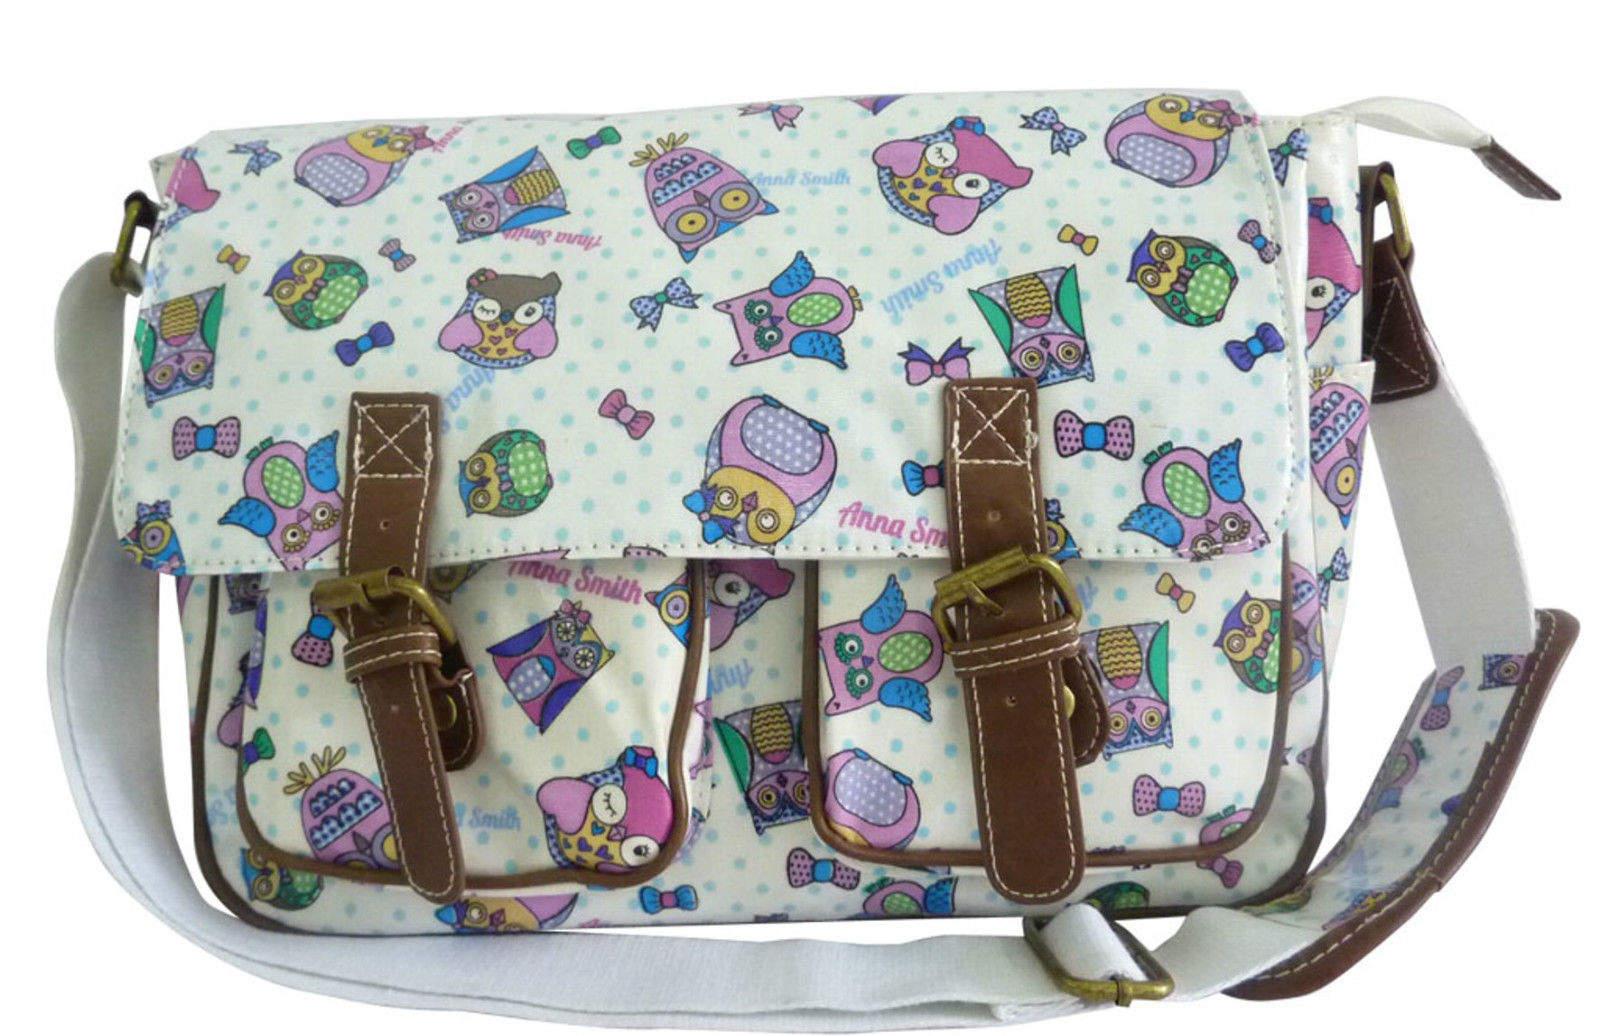 Another Owl Print Satchel Bag WHITE handbags - Girls School Oilcloth ... 633b0475440